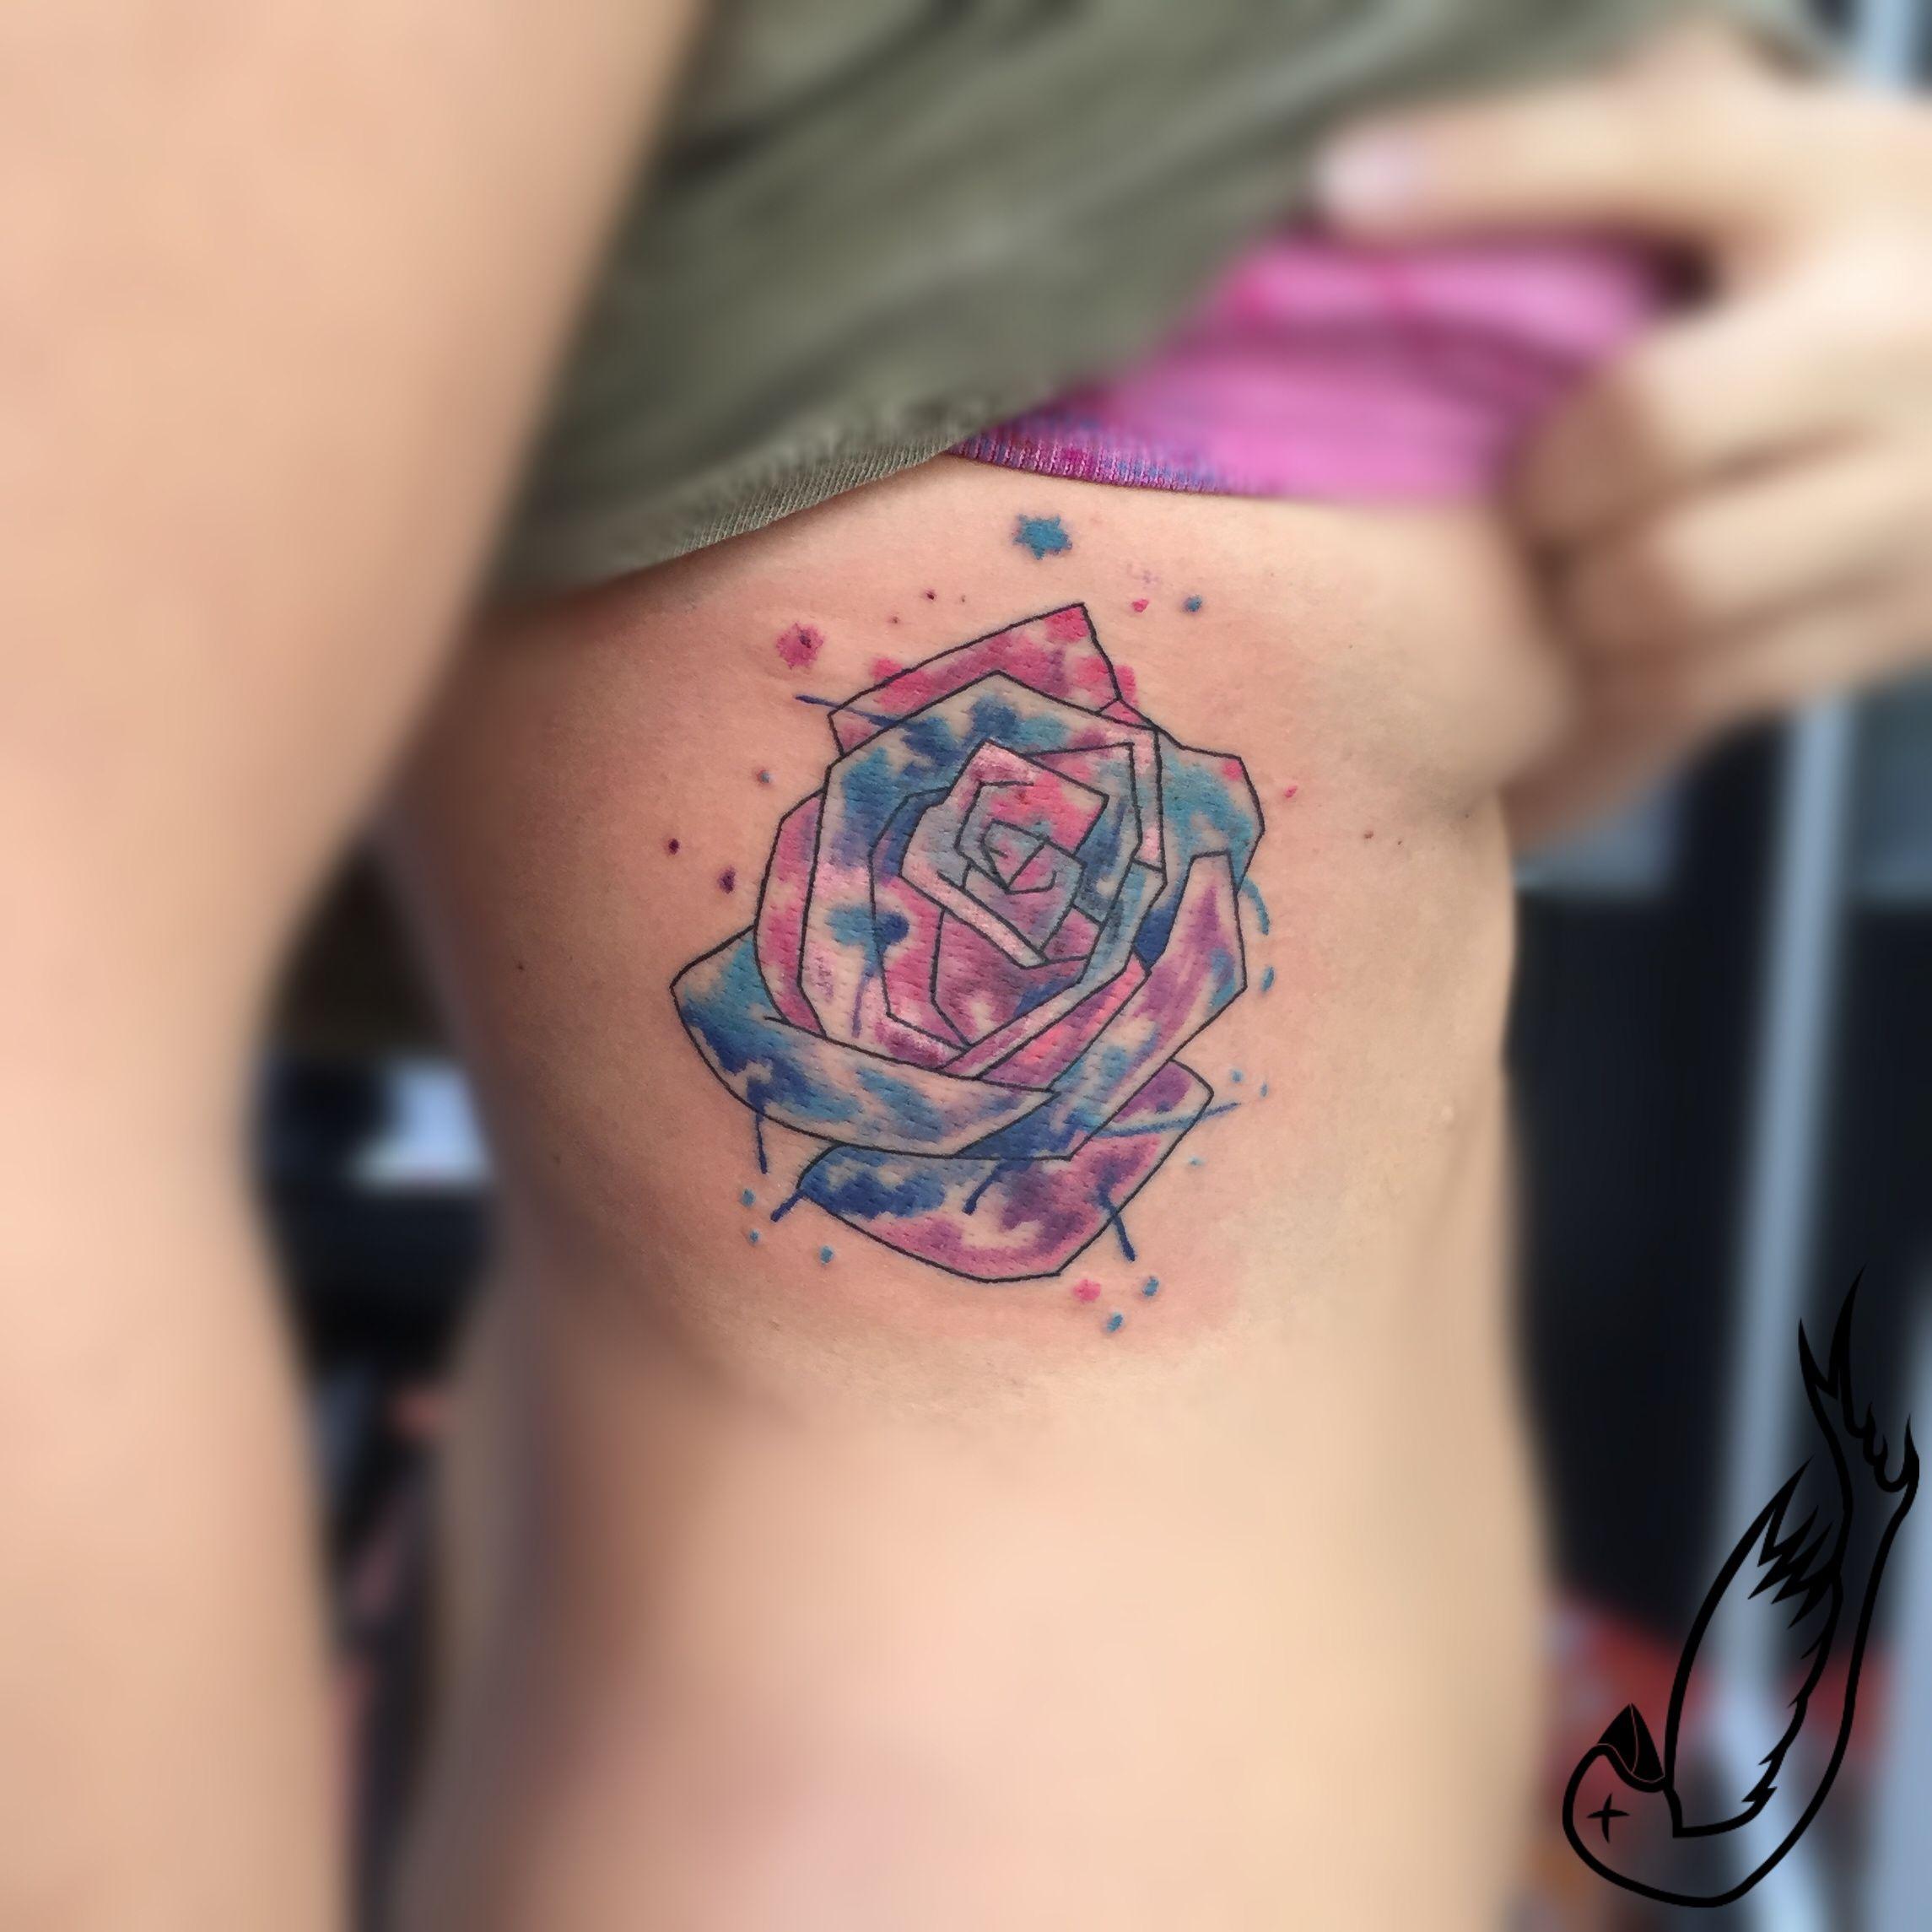 Watercolor tattoo artists in houston texas - Rose Tattoo Blue Watercolor Watercolour Falling Bird Studio Falling Bird Tattoo Pinterest Rose Tattoos Tattoo And Tattoo Studio